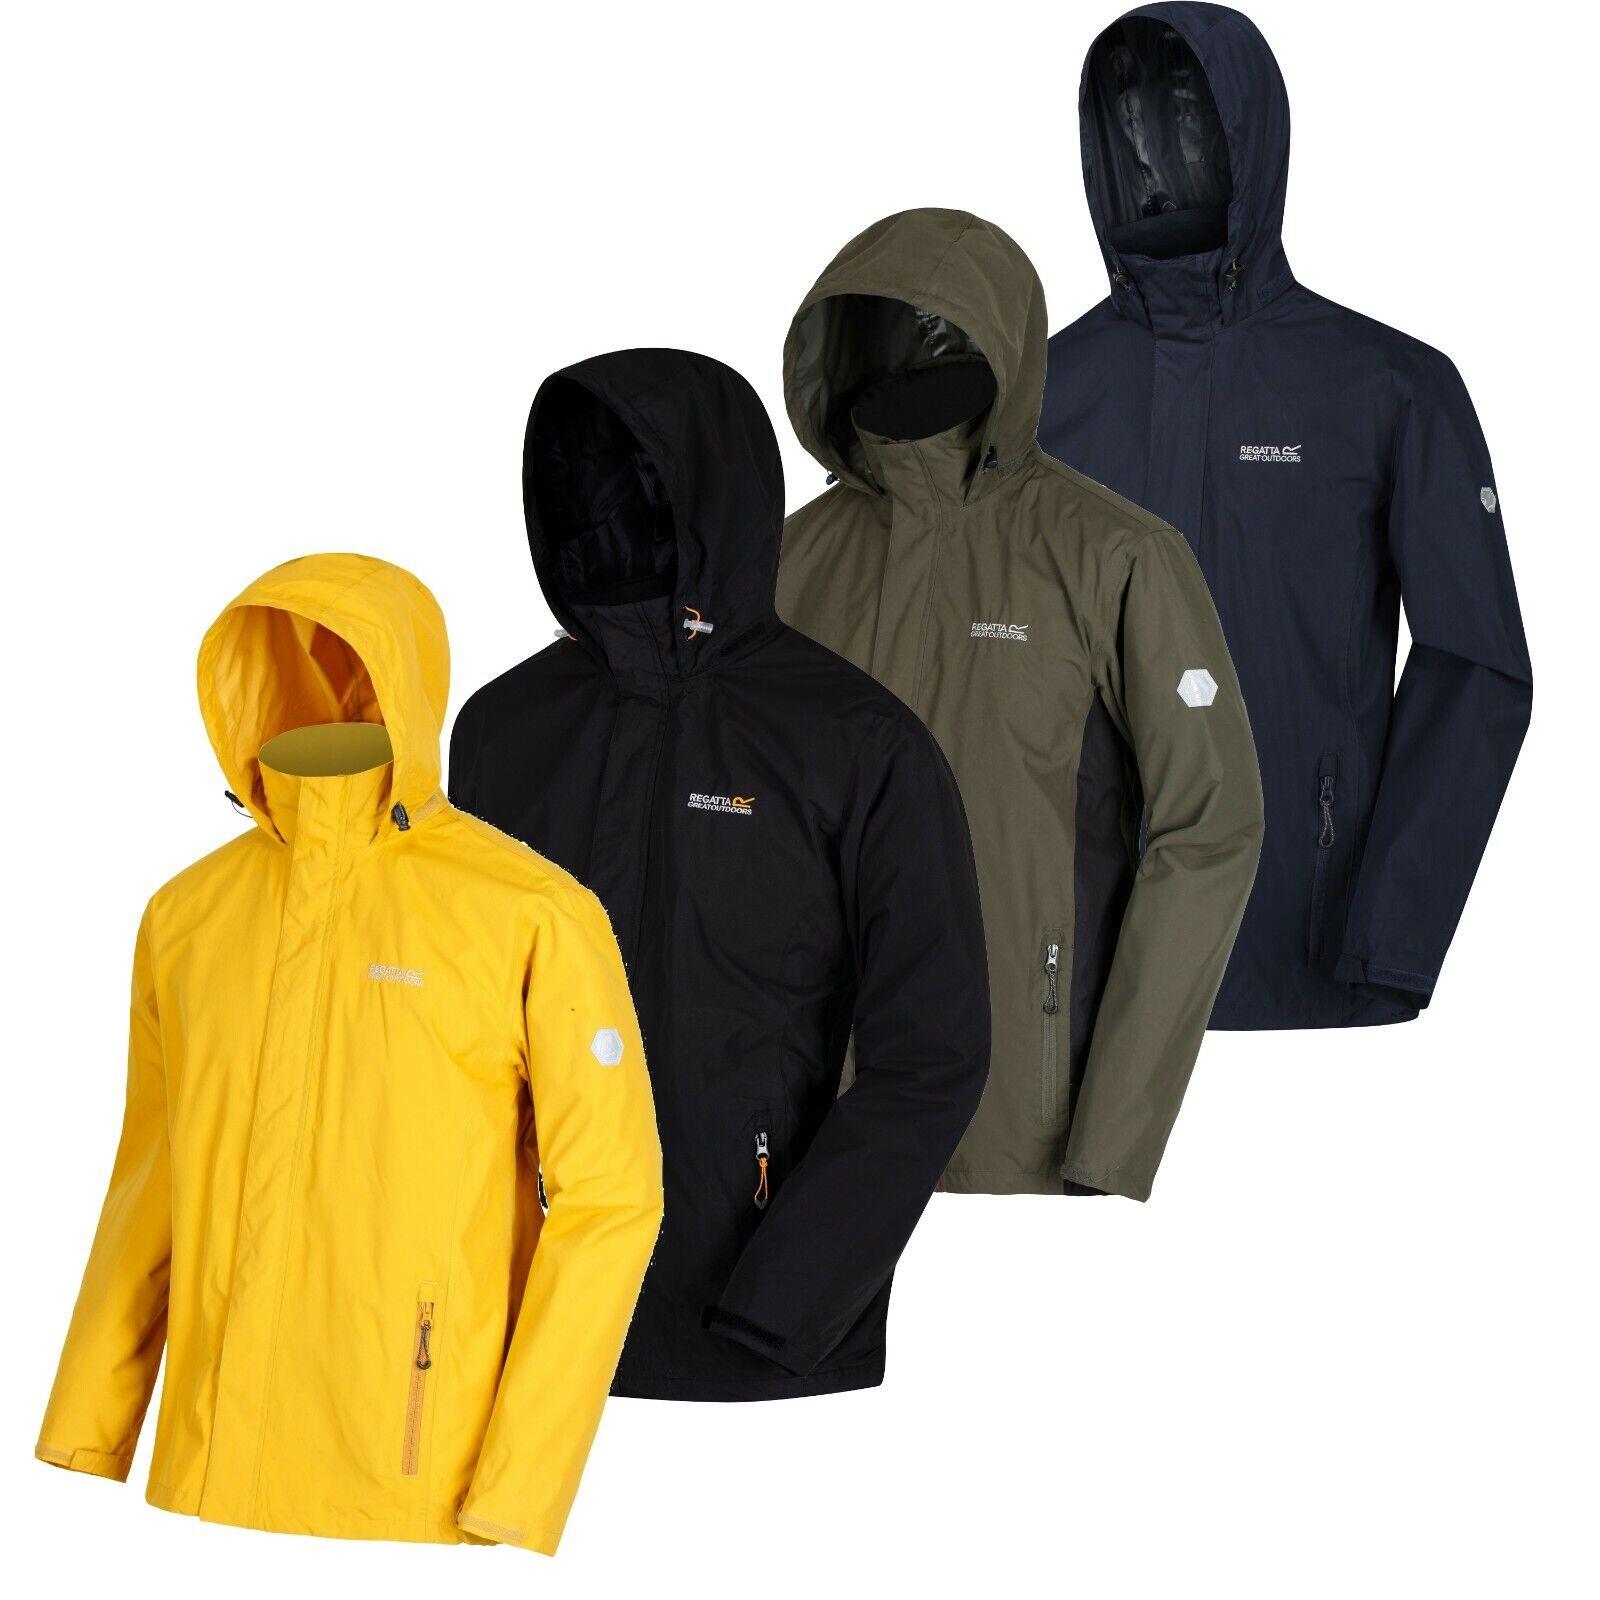 Regatta Mens Jacket Waterproof Hydrafort 5000 Coat Shell Hooded XS–3XL Free PnP